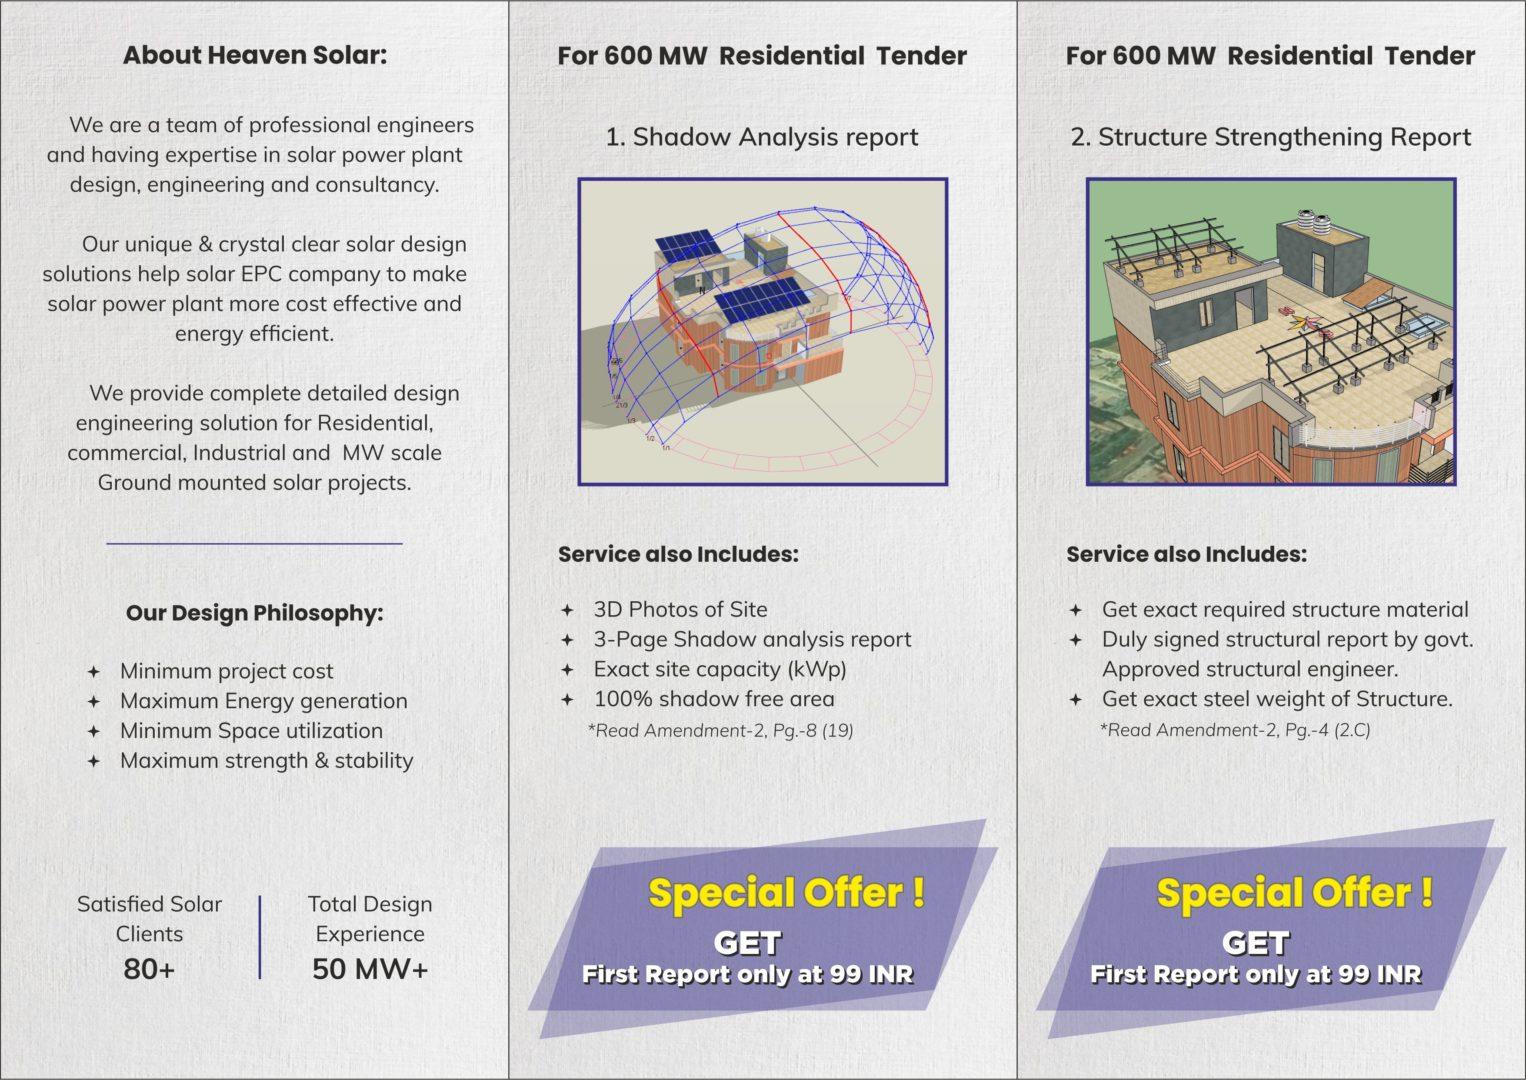 SHADOW ANALYSIS & STRUCTURE DESIGN SERVICE